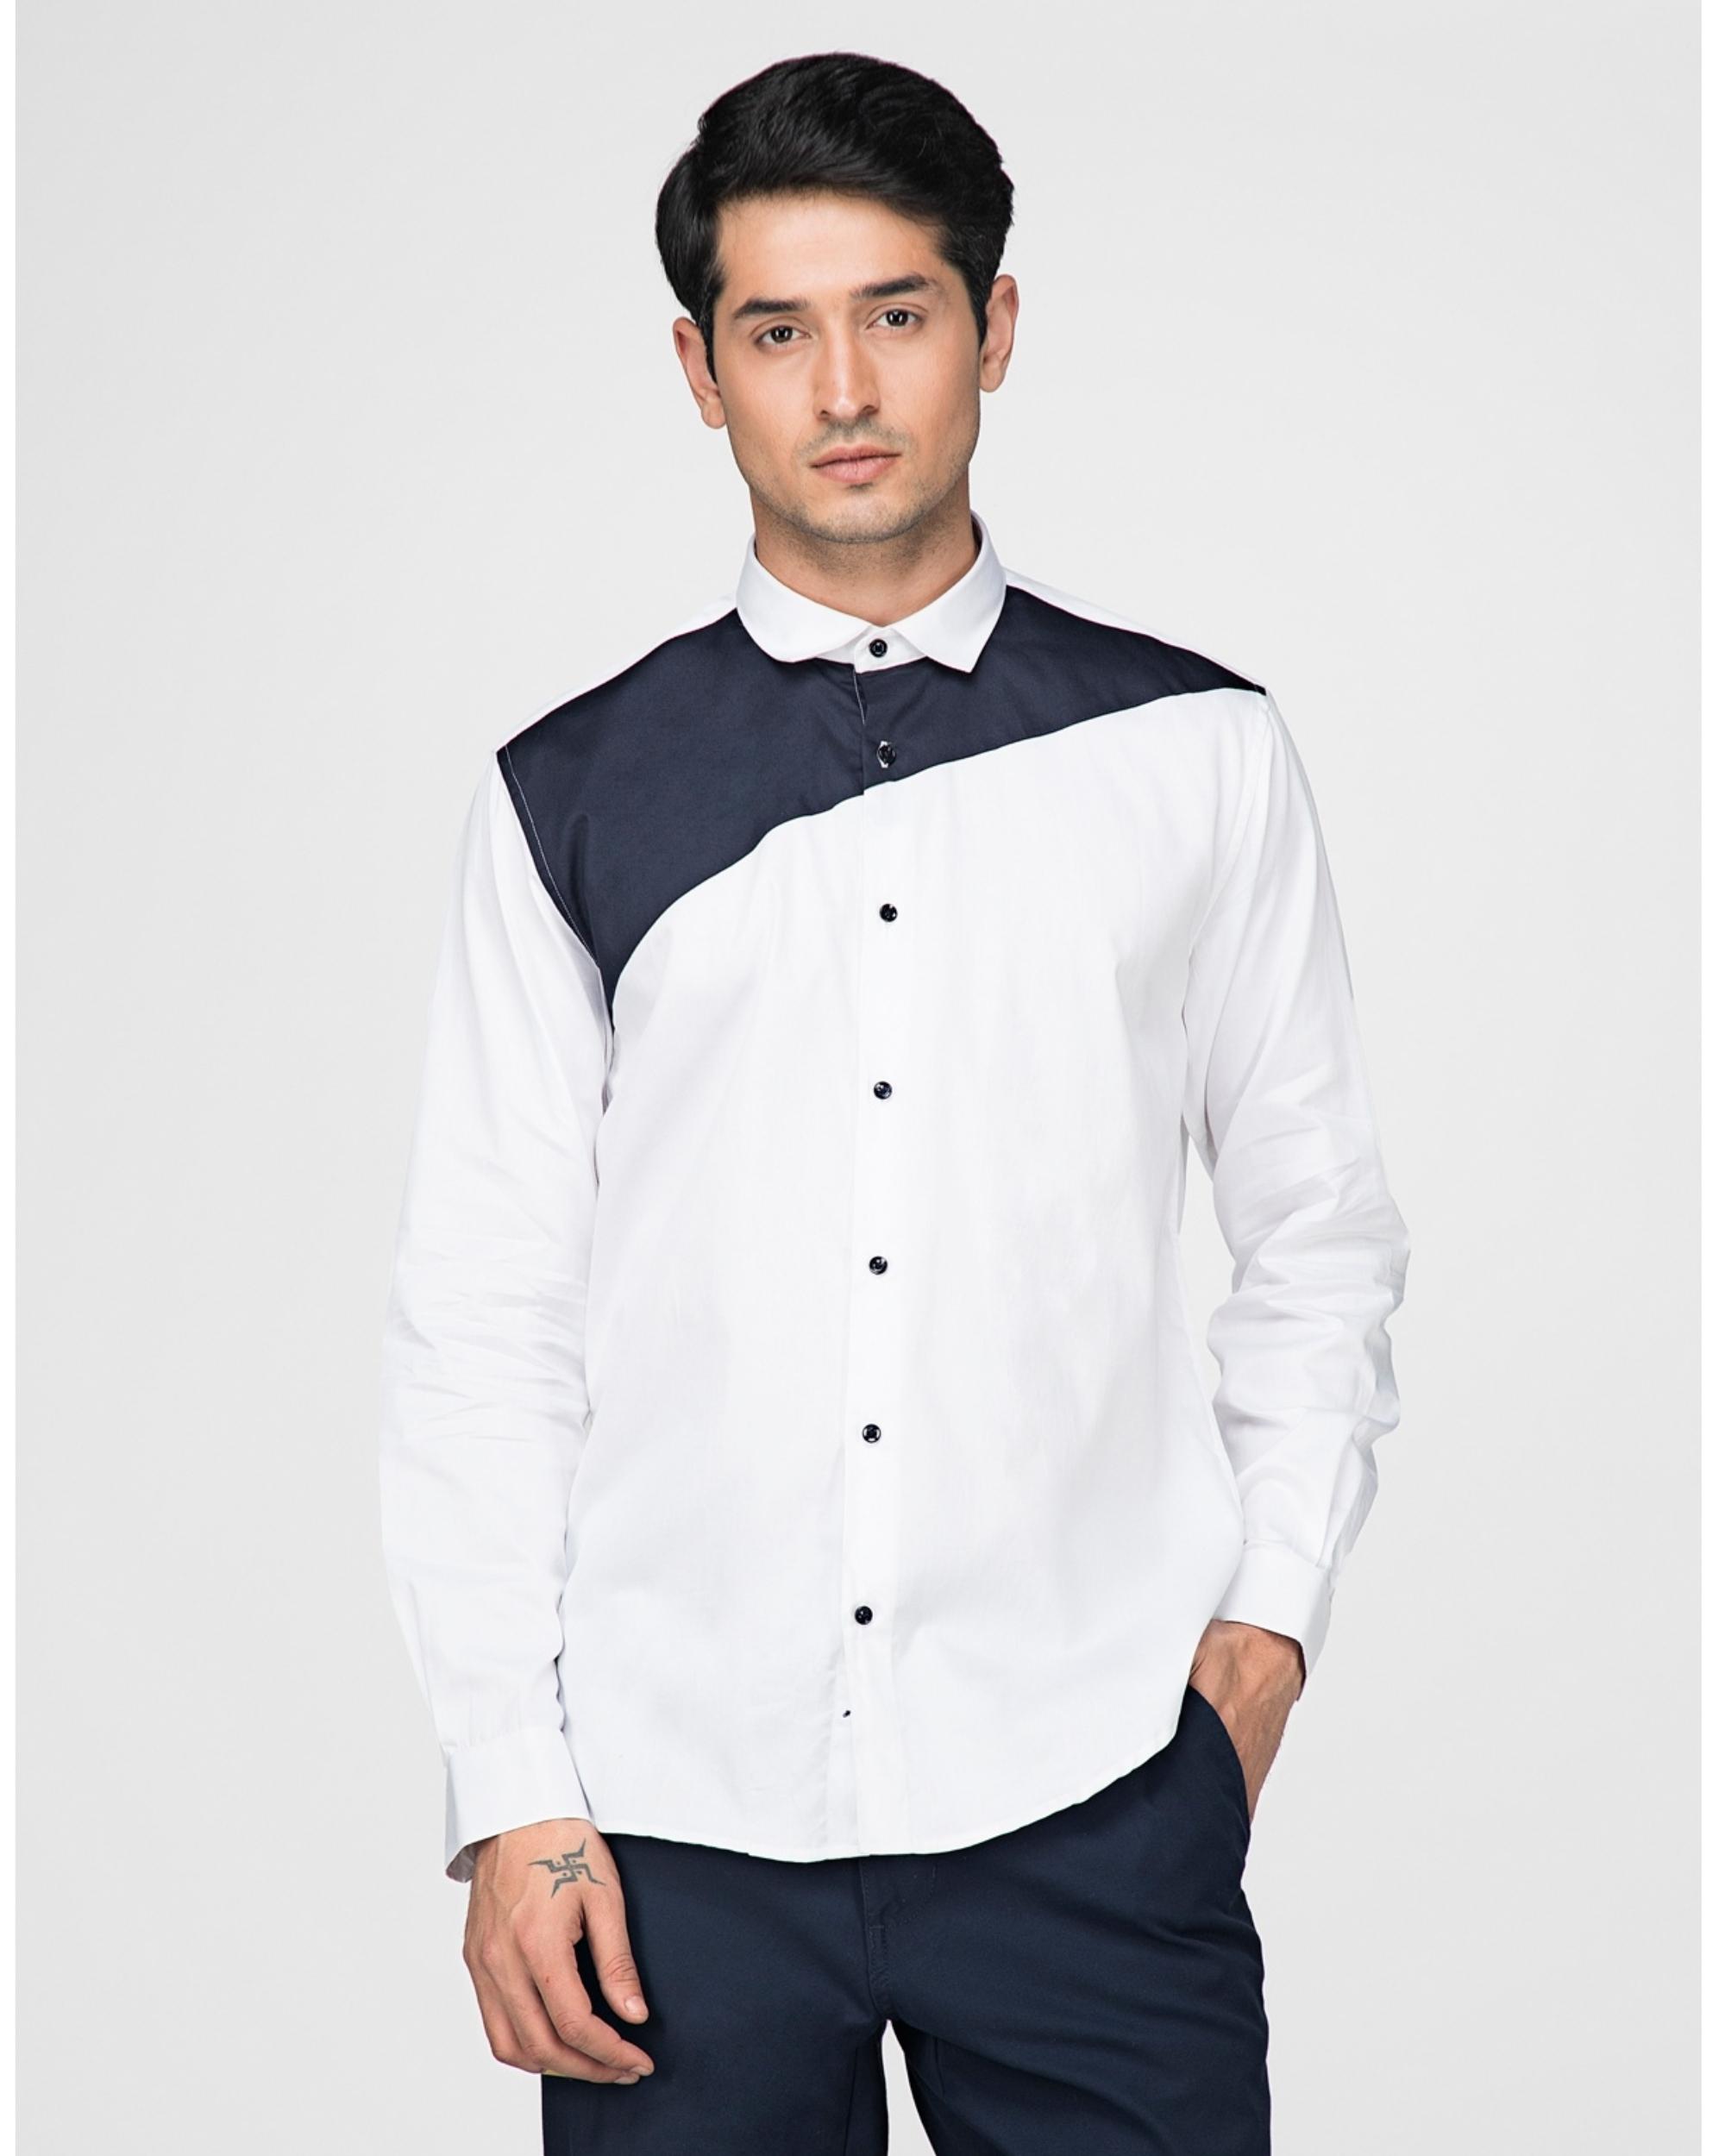 White and navy blue trigon paneled shirt